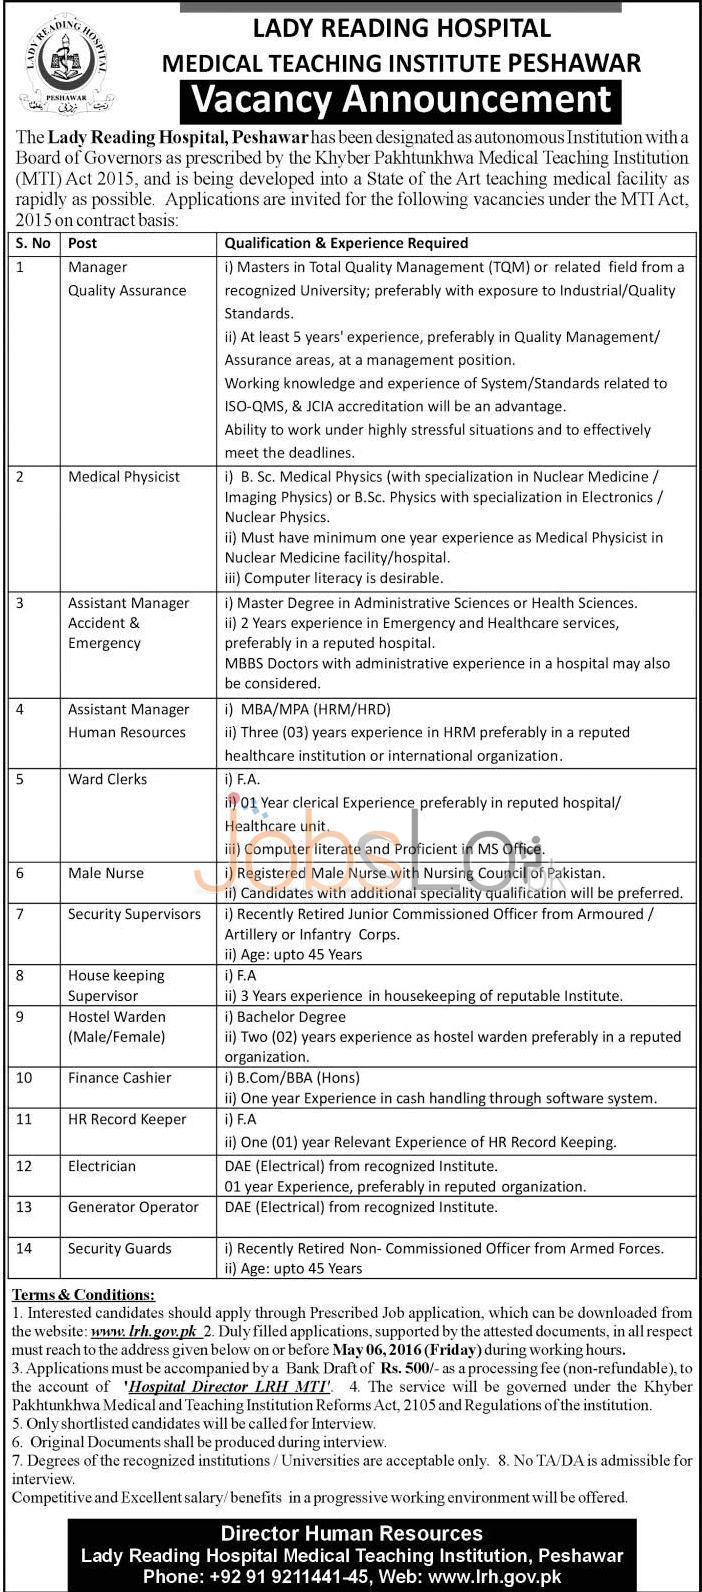 Lady Reading Hospital Peshawar Jobs April 2016 Application Form www.lrh.gov.pk